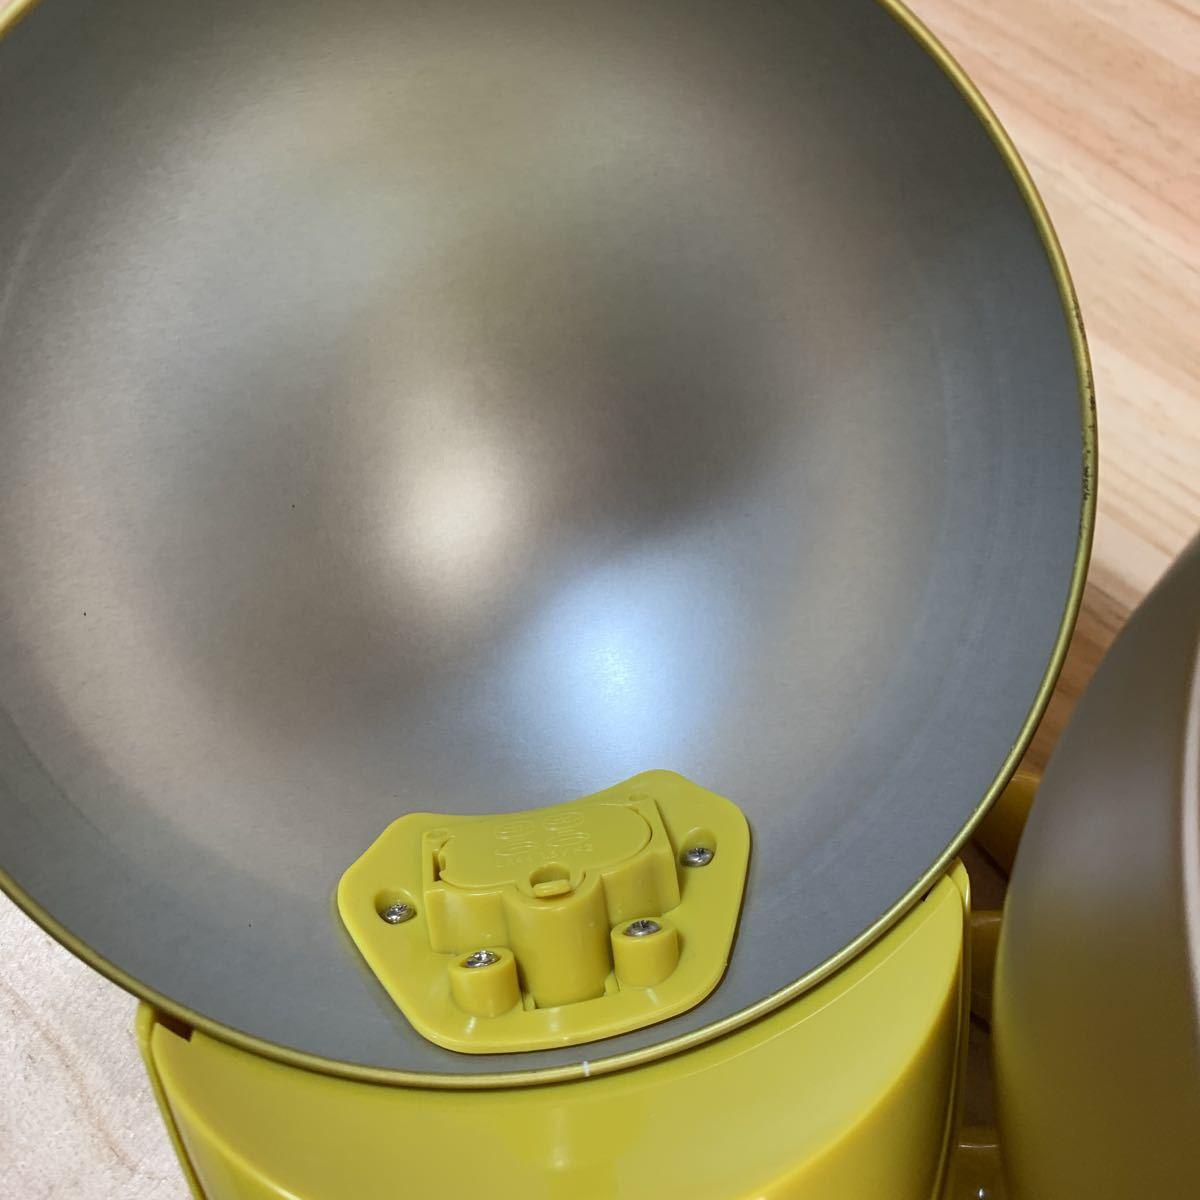 4N8728-5 しゃべる 金のキョロちゃん缶 森永チョコボール おもちゃのカンヅメ_画像4